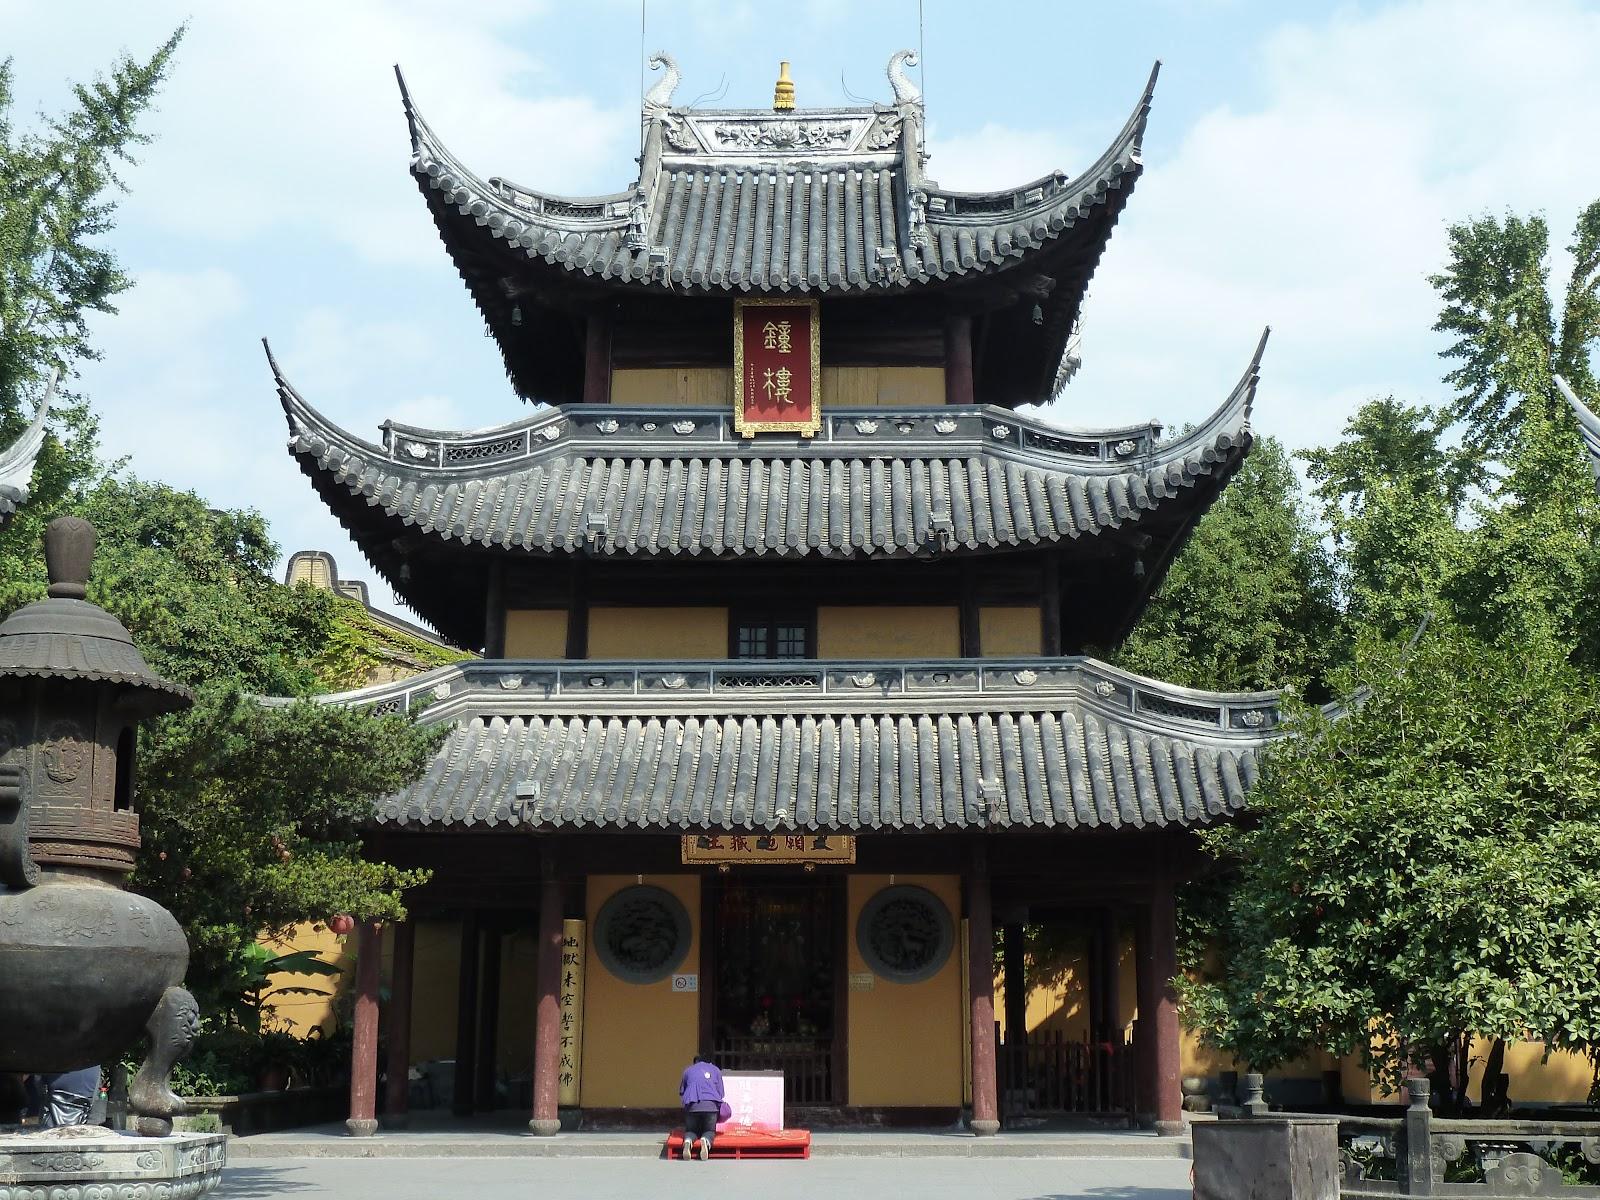 Heidi in shanghai 2012 longhua tempel und botanischer garten - Botanischer garten shanghai ...